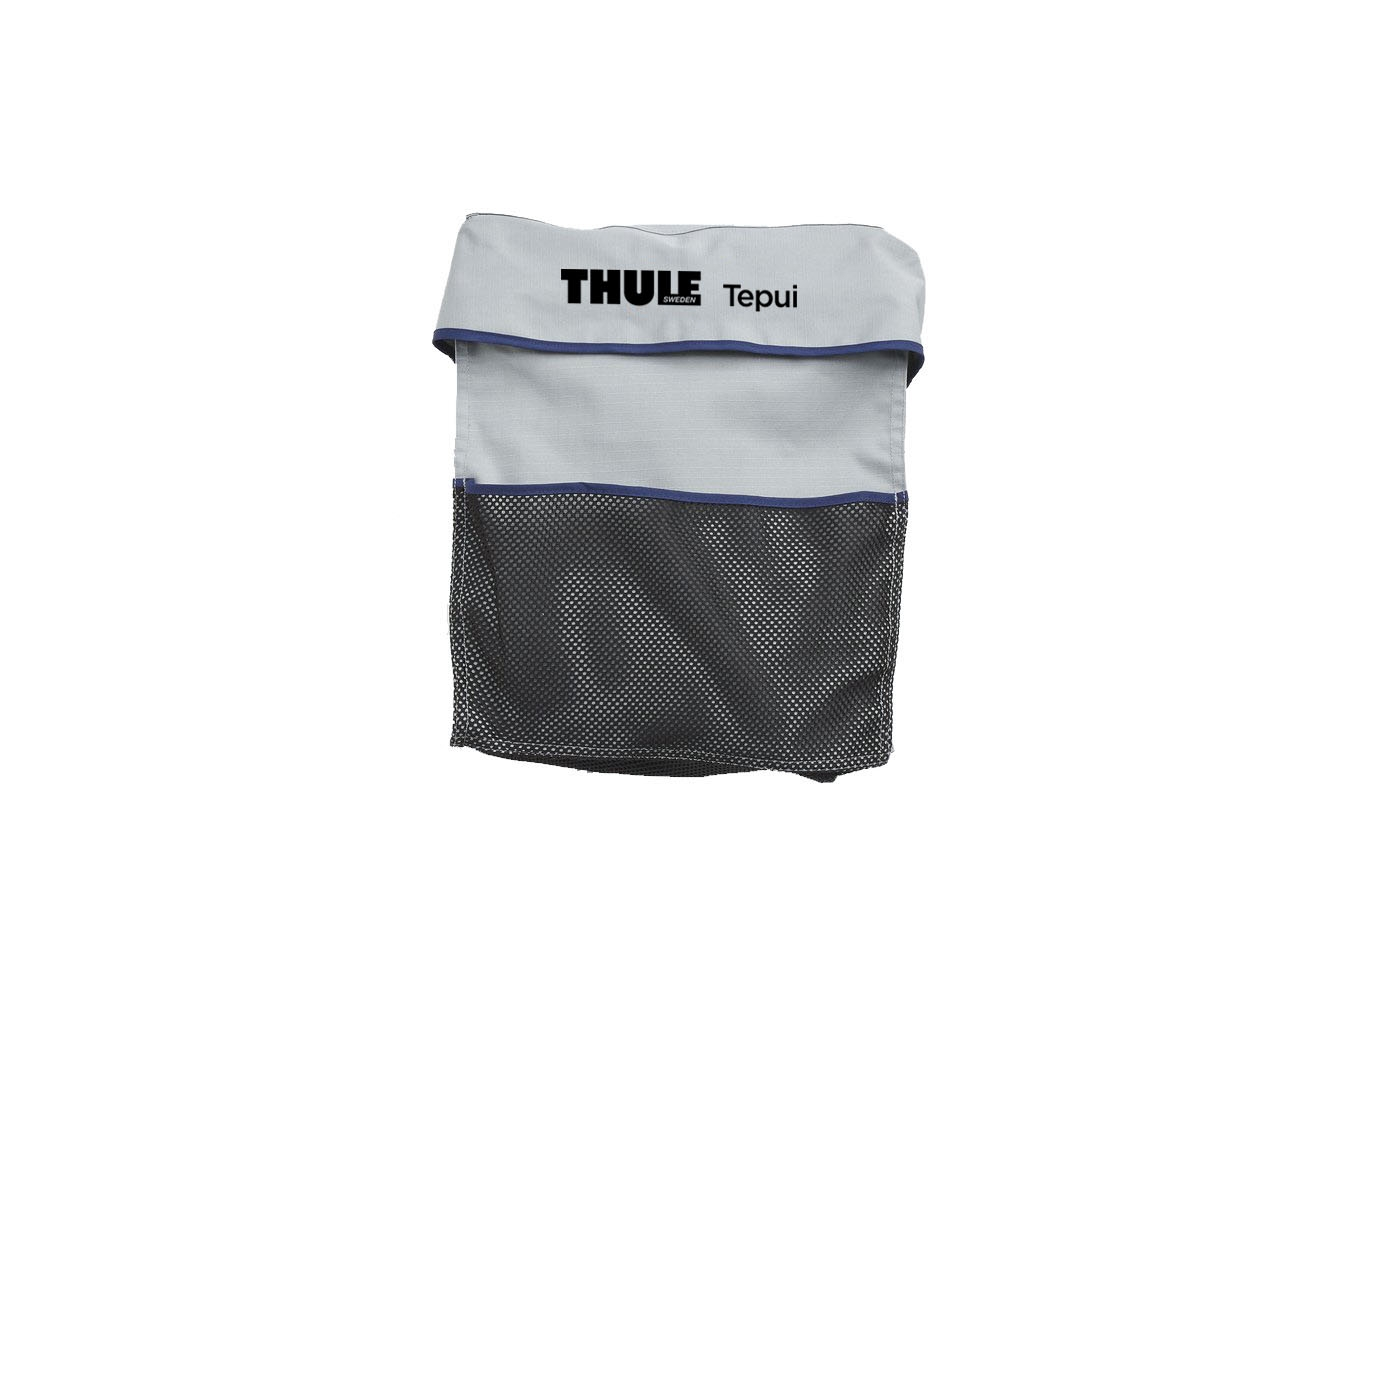 Thule Tepui Boot Bag Single Haze Gray